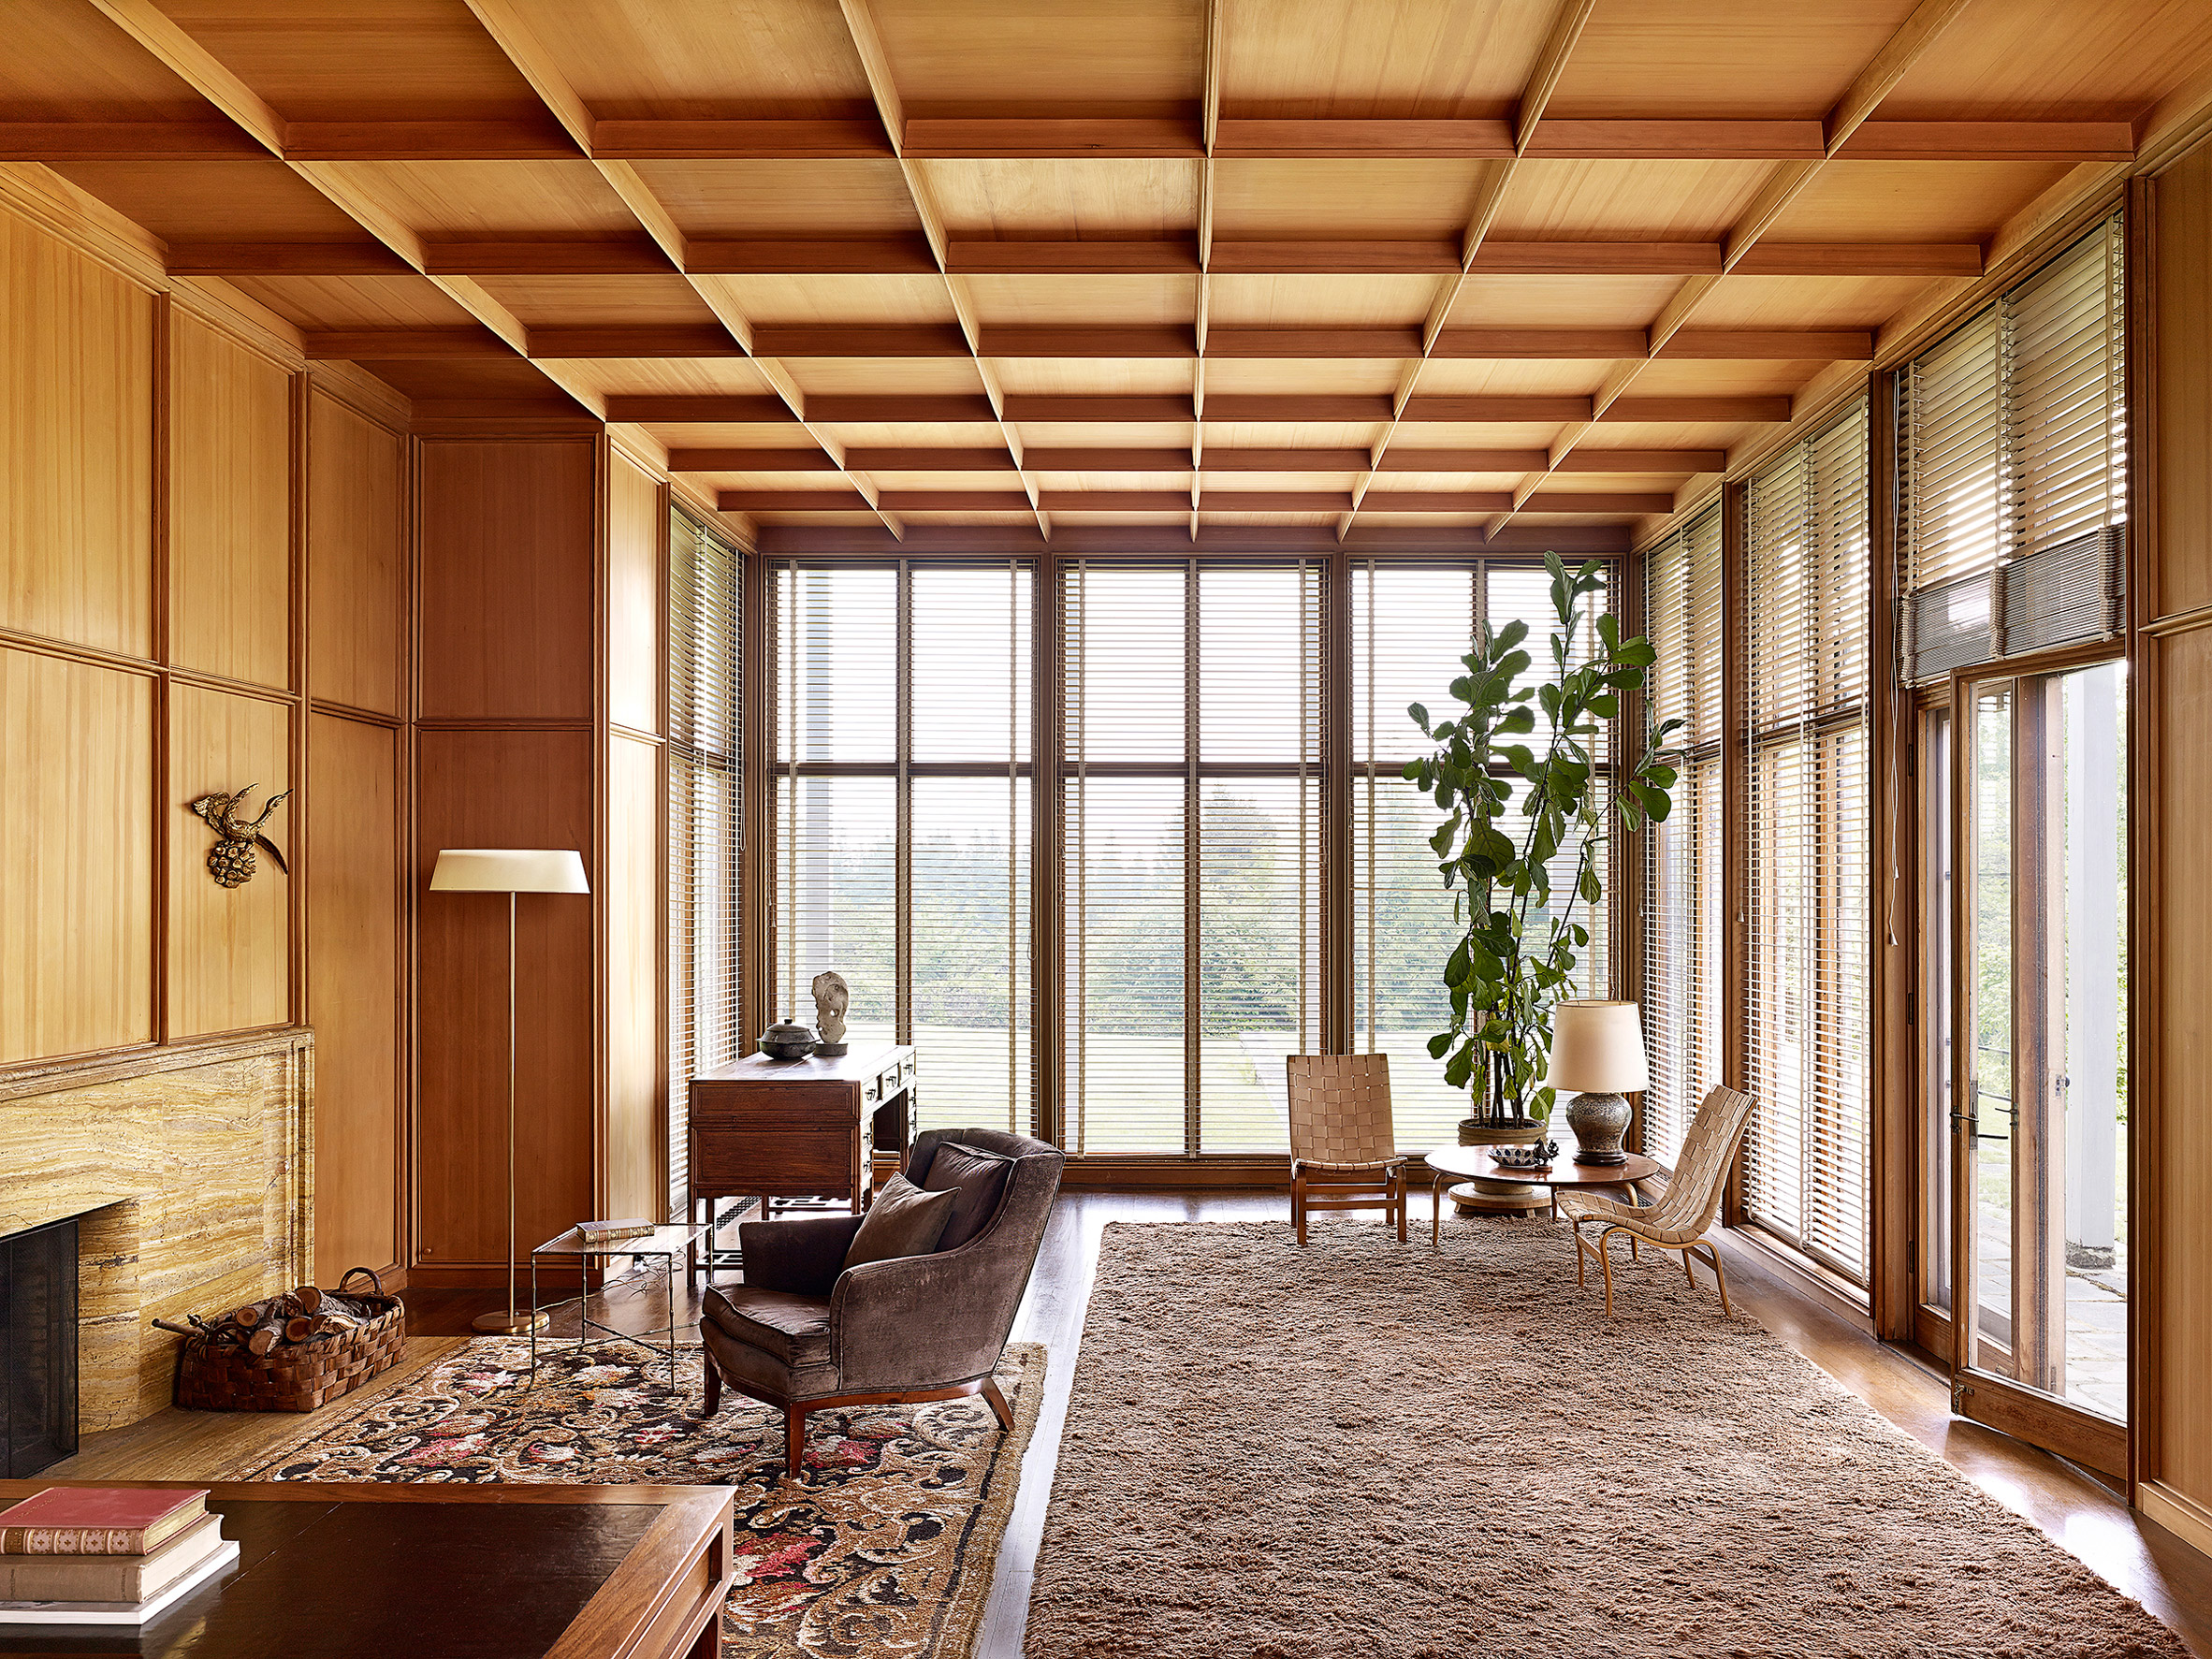 Portland Art Museum spotlights local modernist architect John Yeon